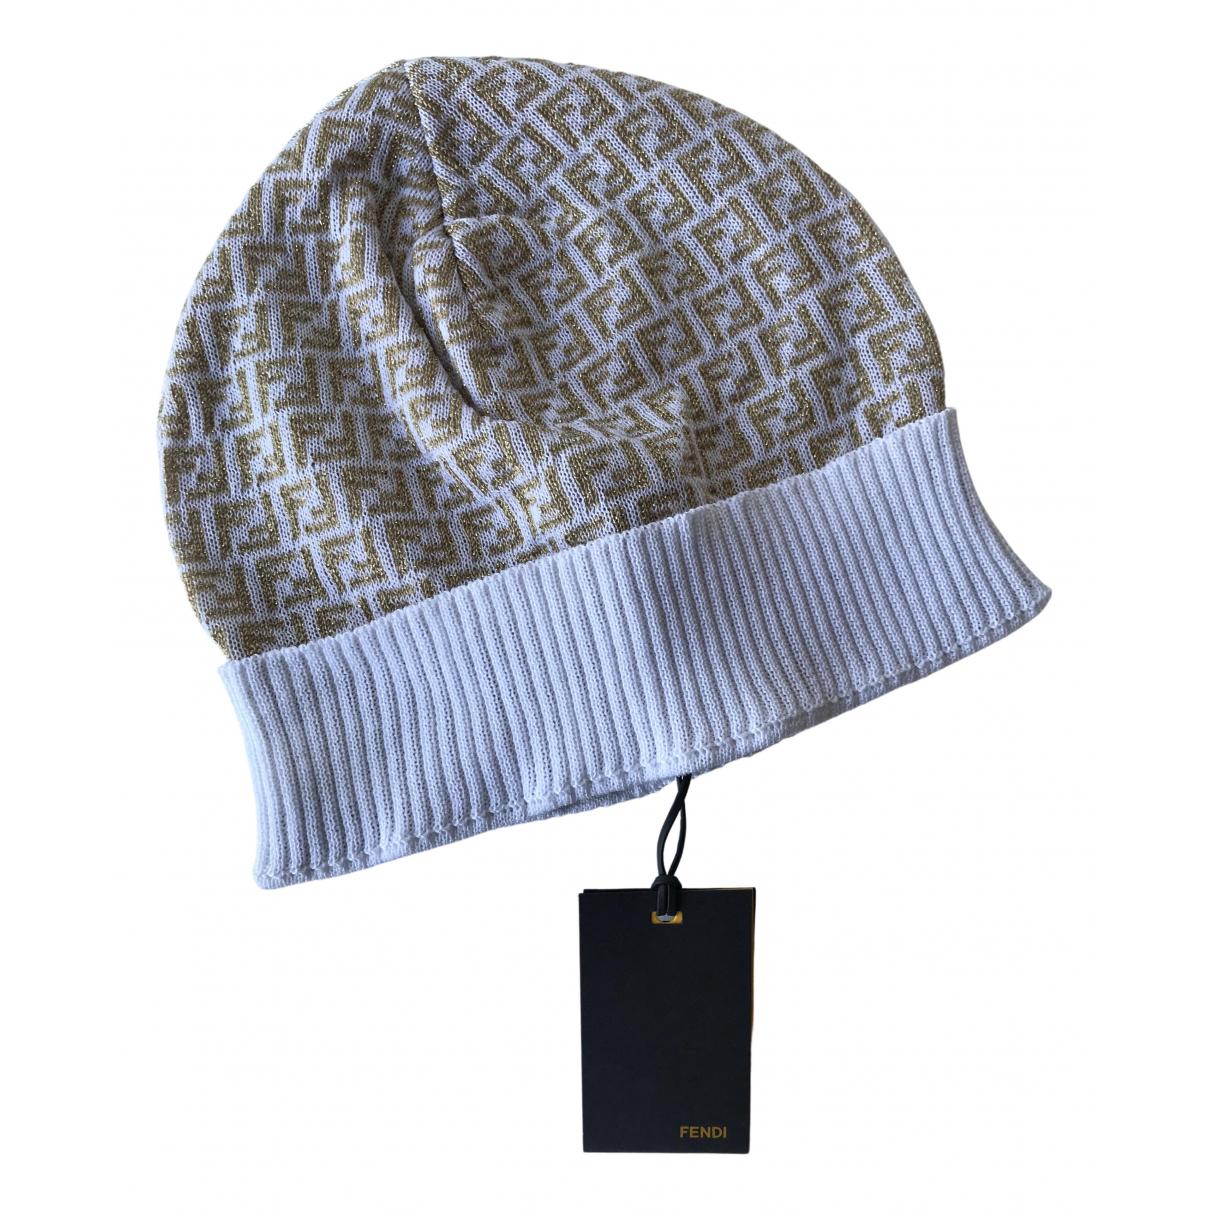 Fendi N Gold Cotton hat for Women L International